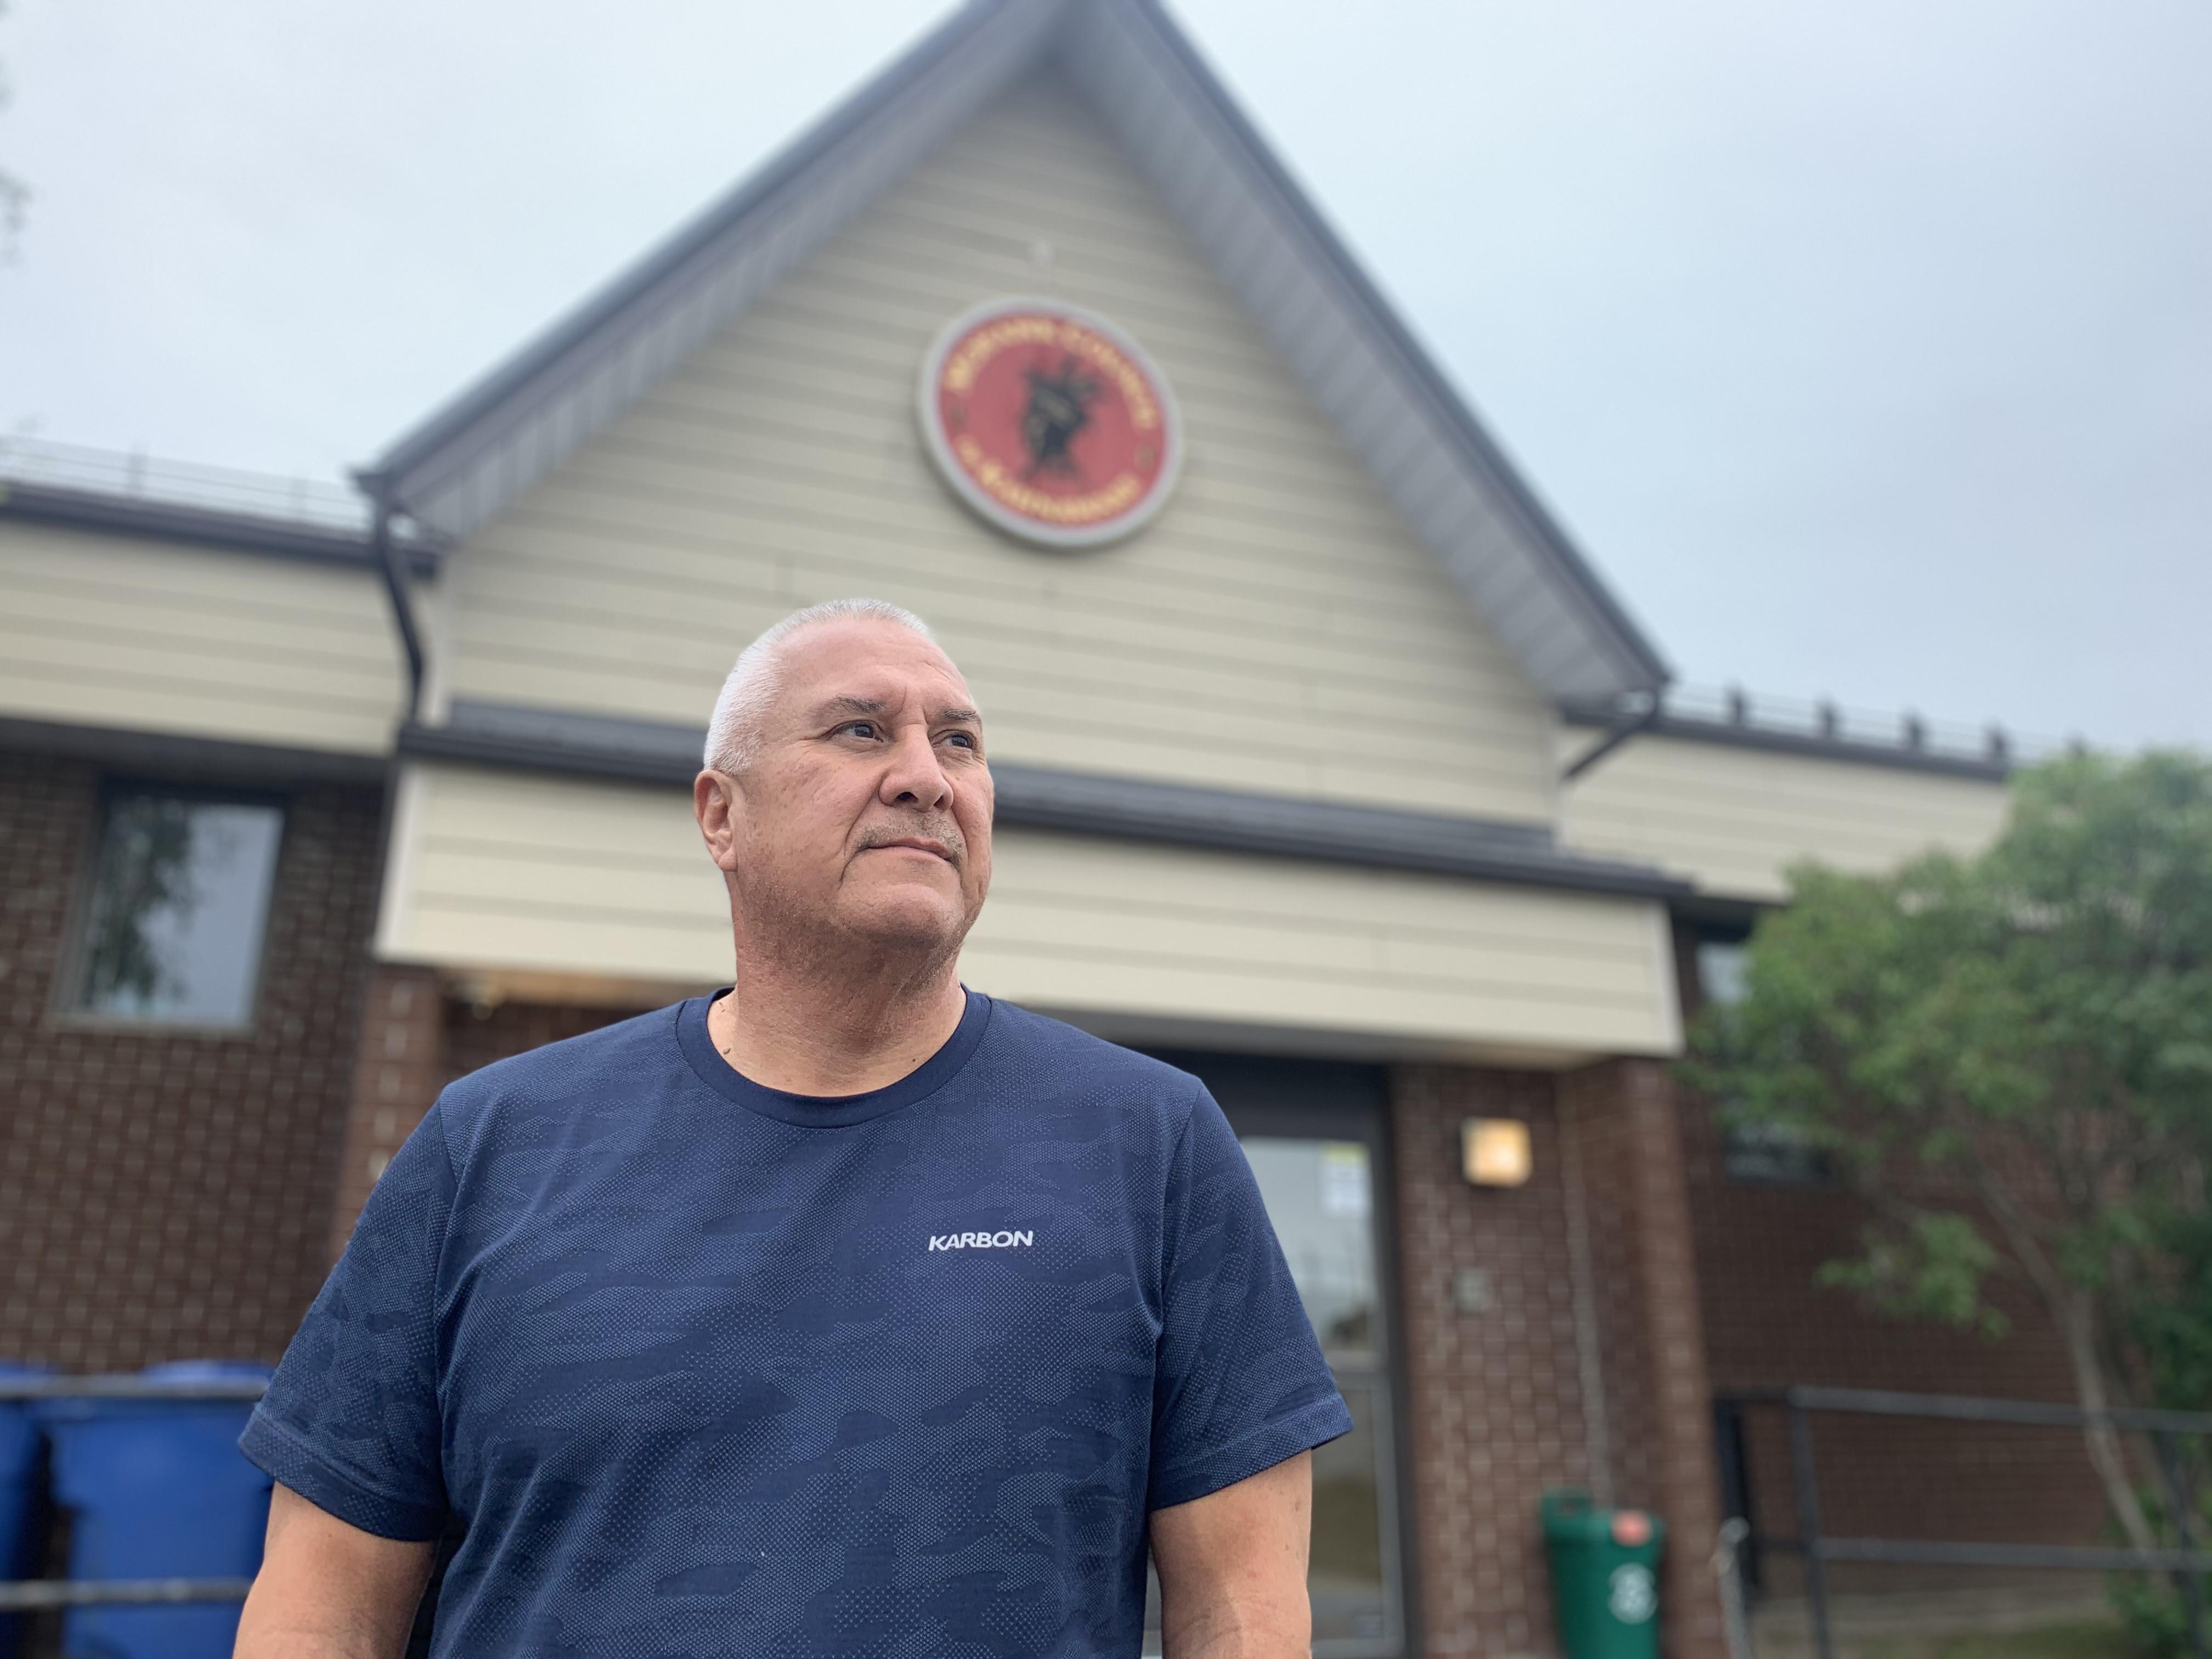 Mike Delisle Jr. is a chief at the Mohawk Council of Kahnawake. (Ka'nhehsí:io Deer/CBC)